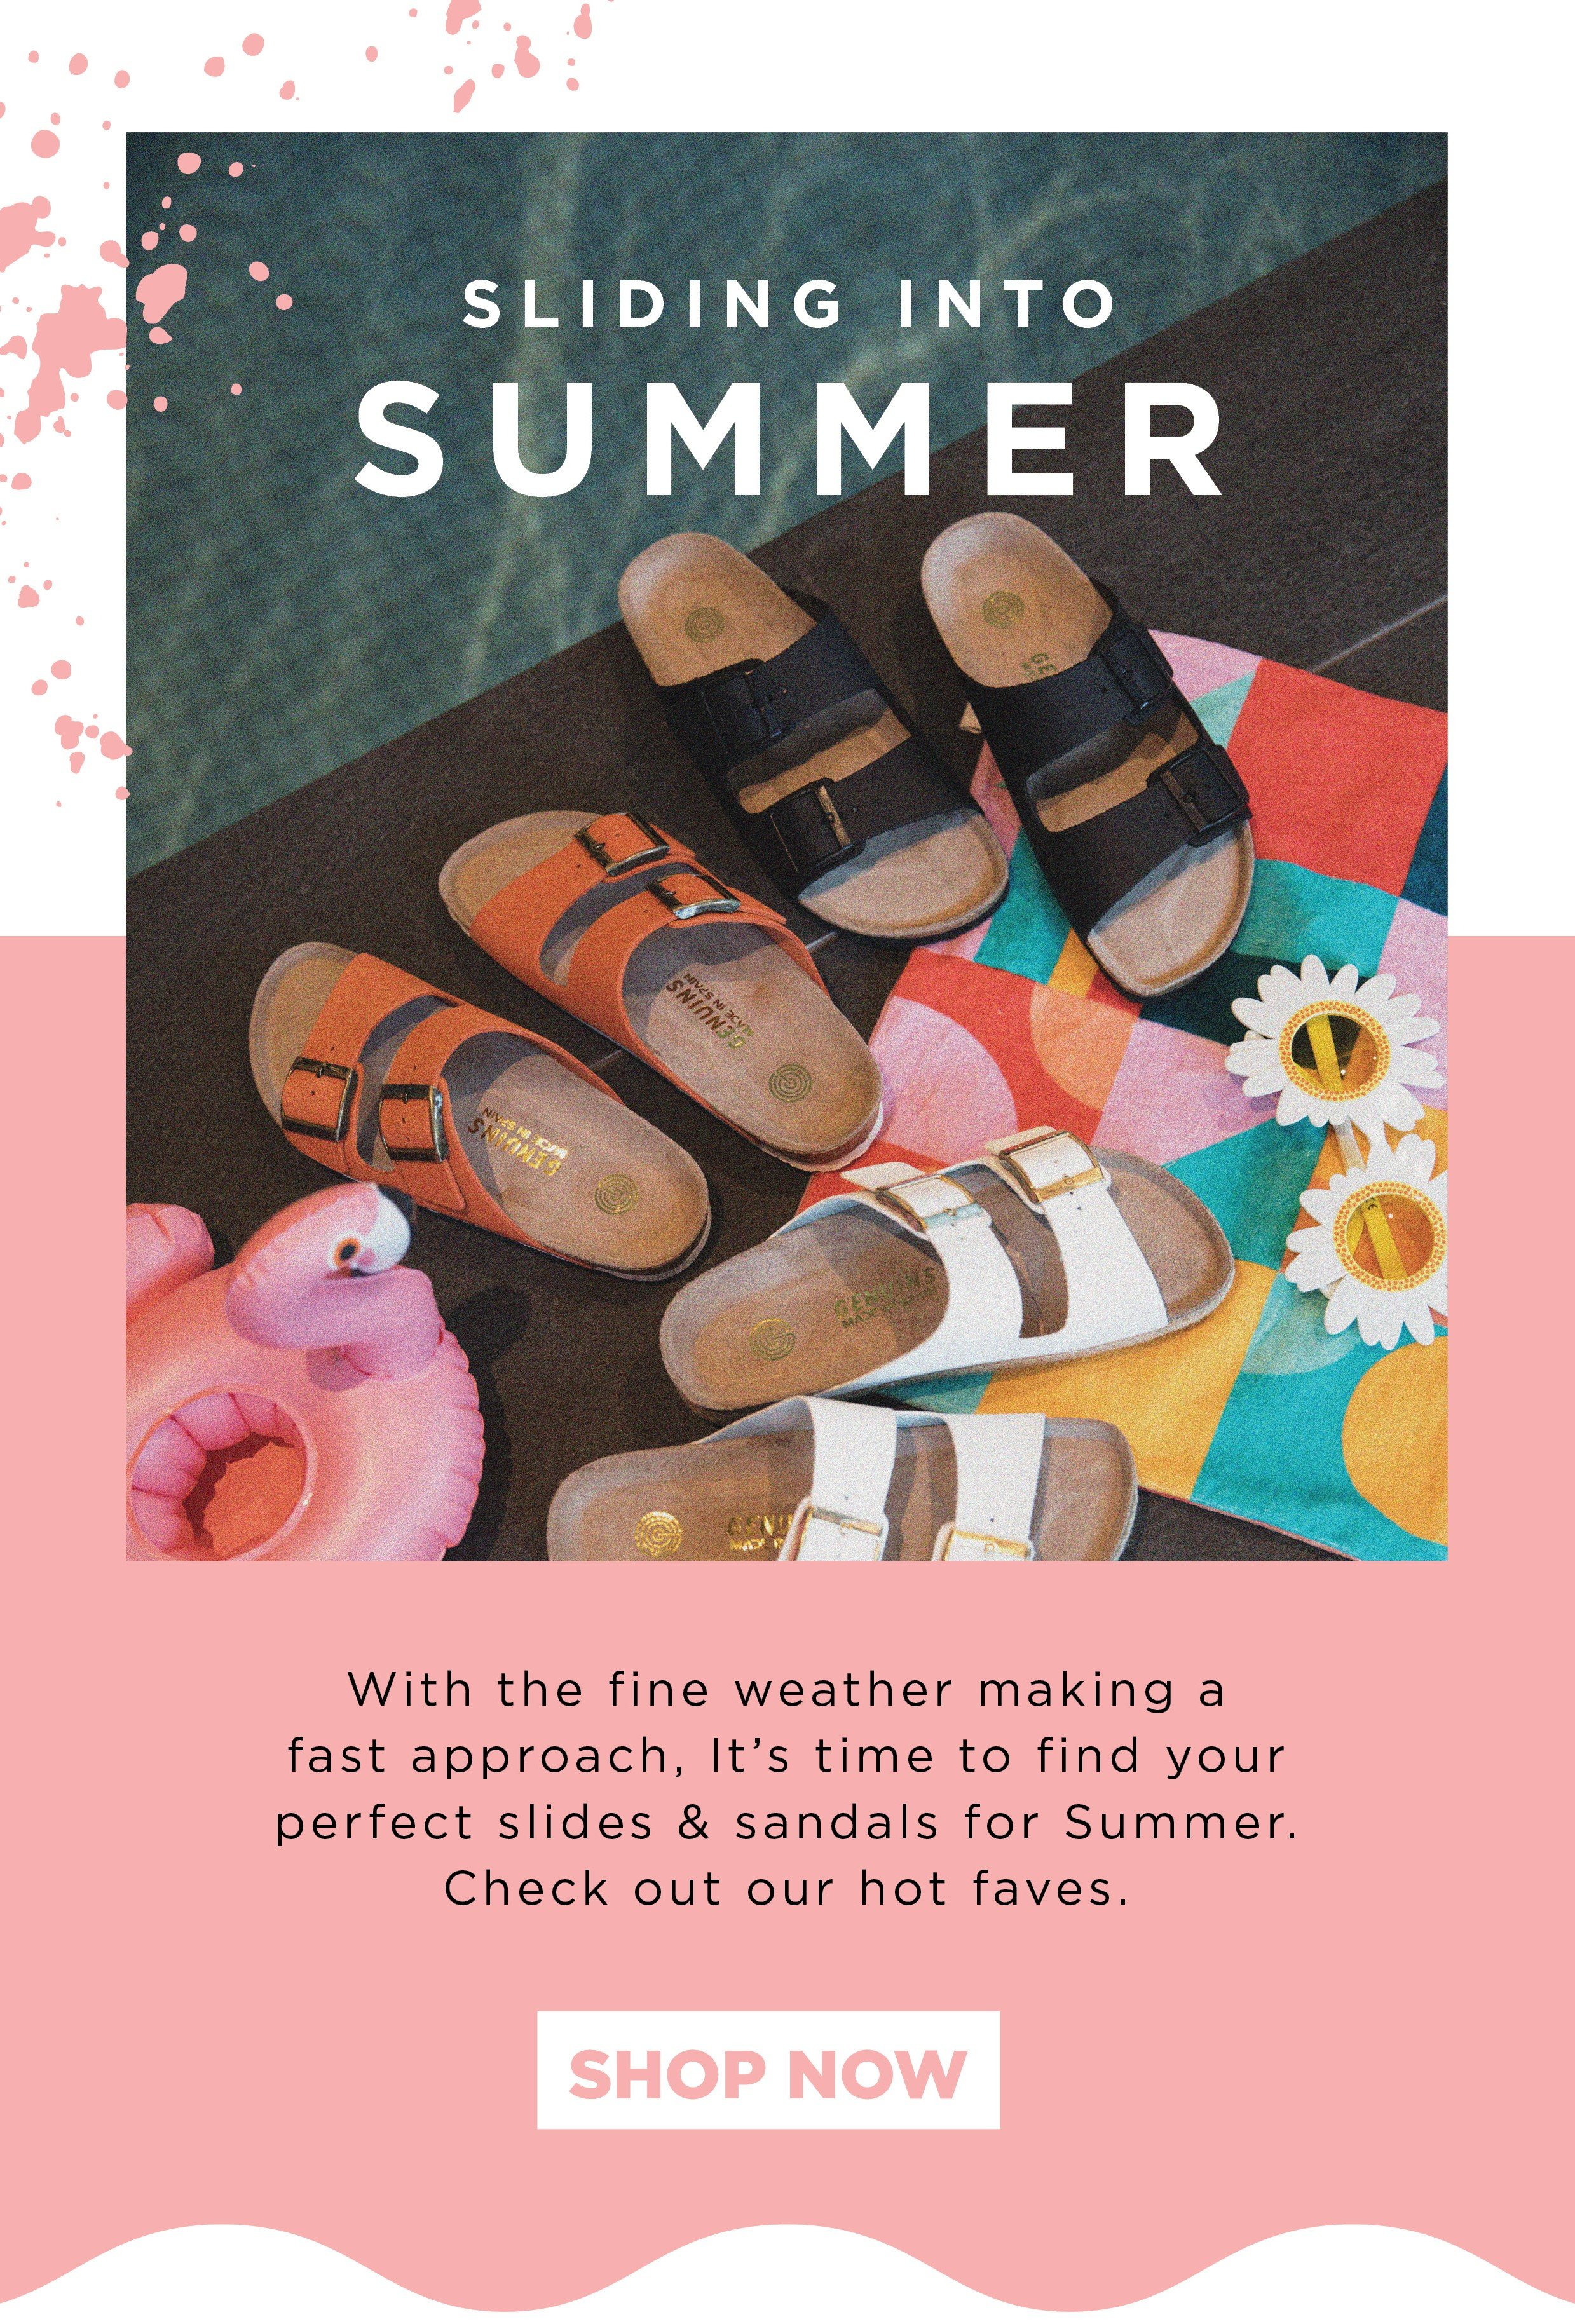 Platypus Shoes: Get Your Summer Slides